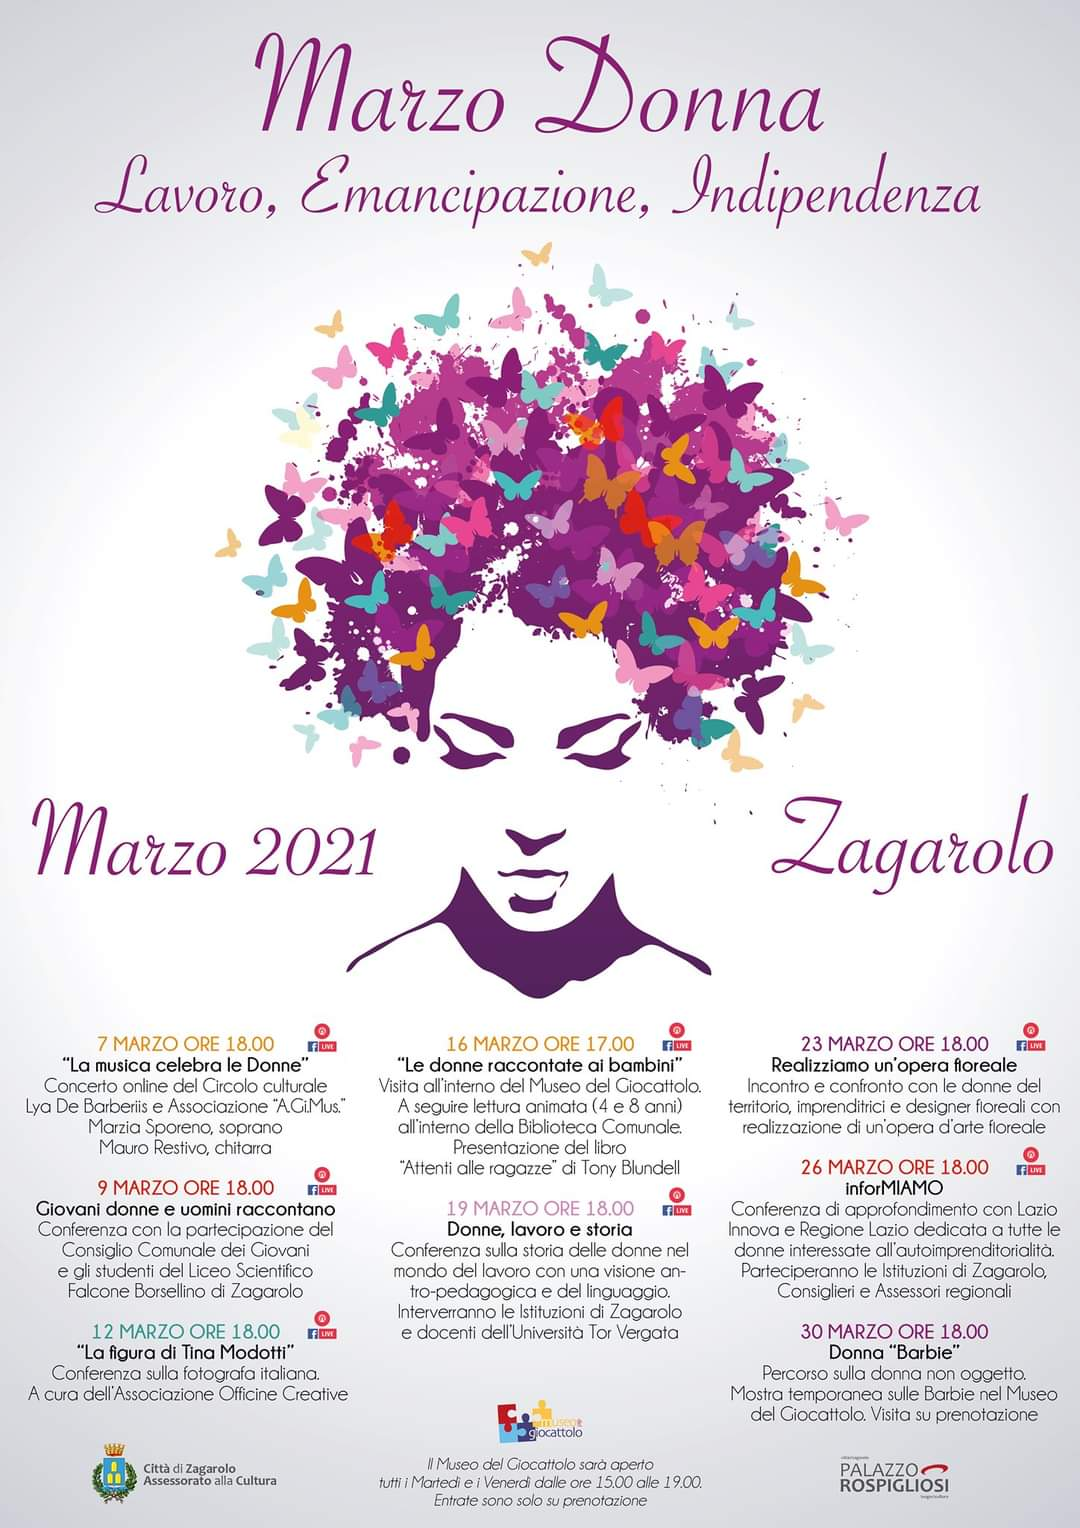 MARZO DONNA 2021 A ZAGAROLO